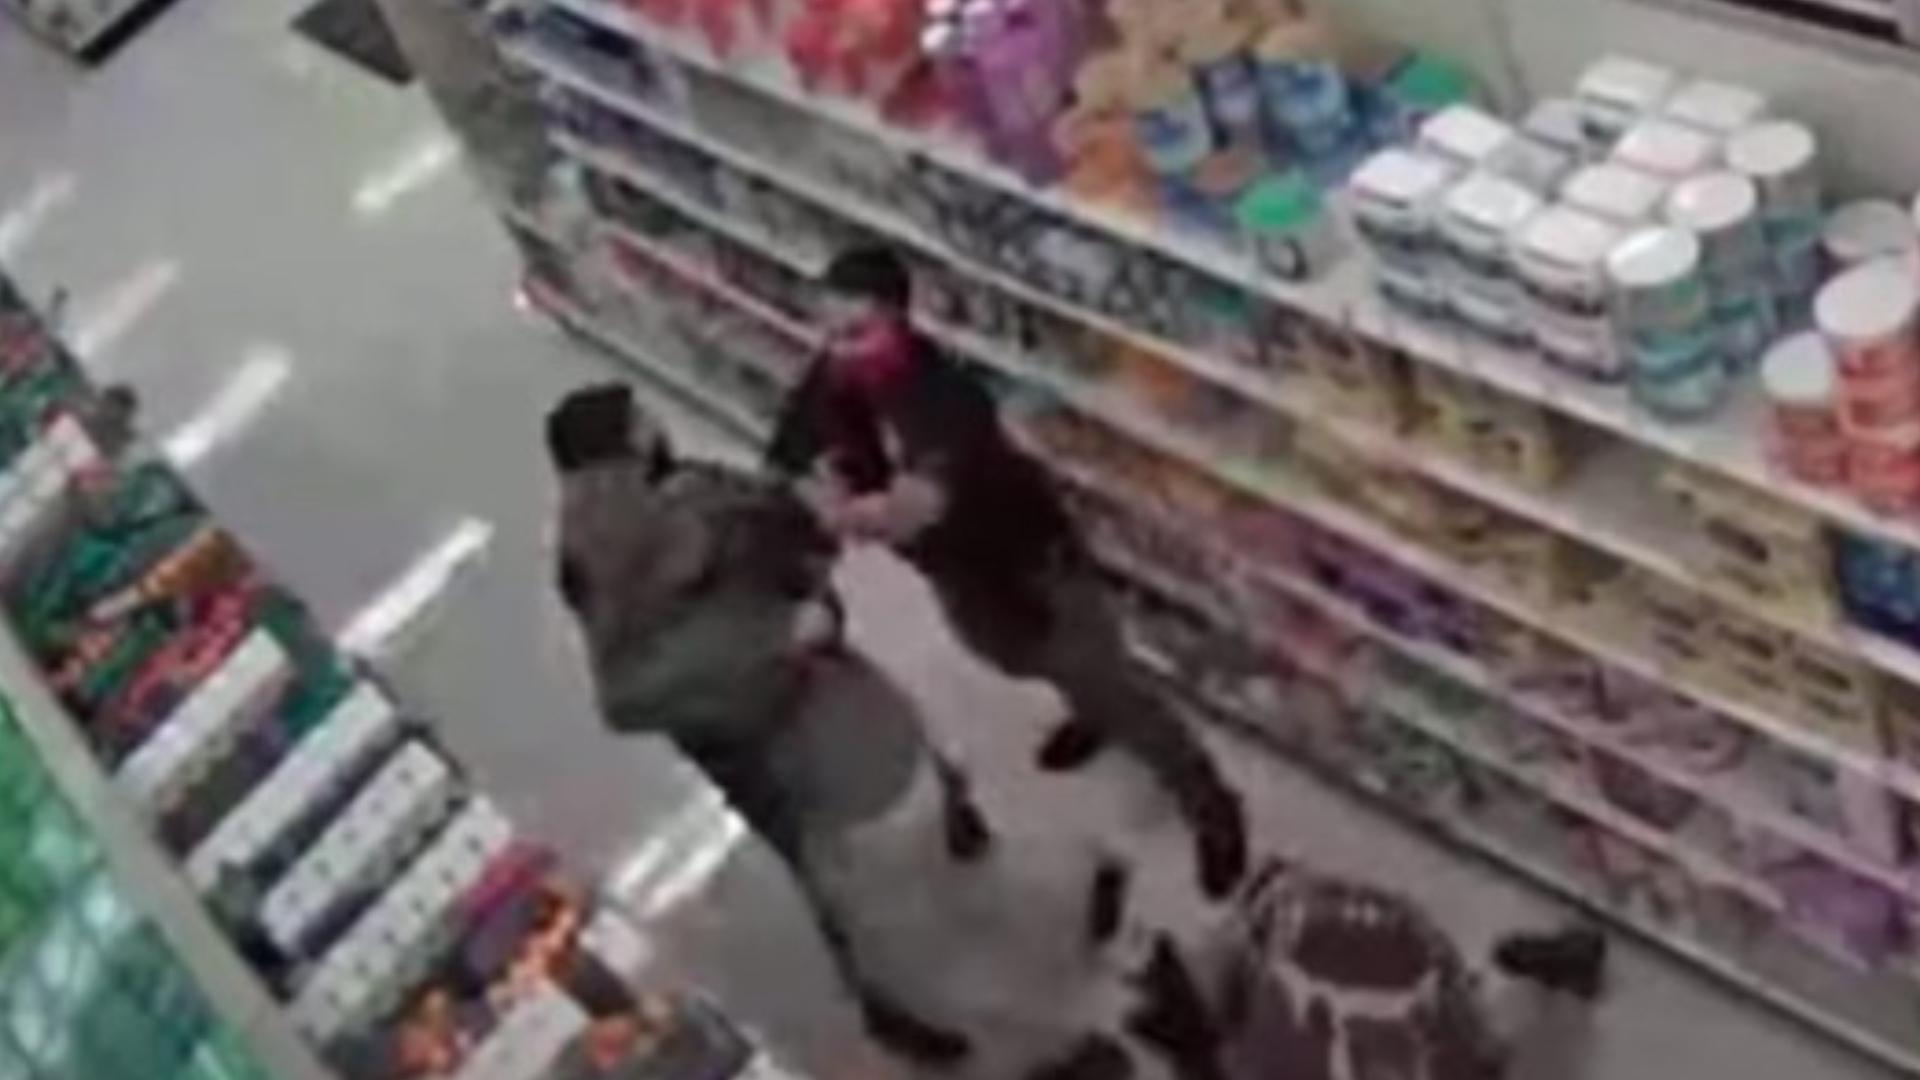 Los Angeles men refusing to wear masks at Target allegedly break employee's arm - TheGrio